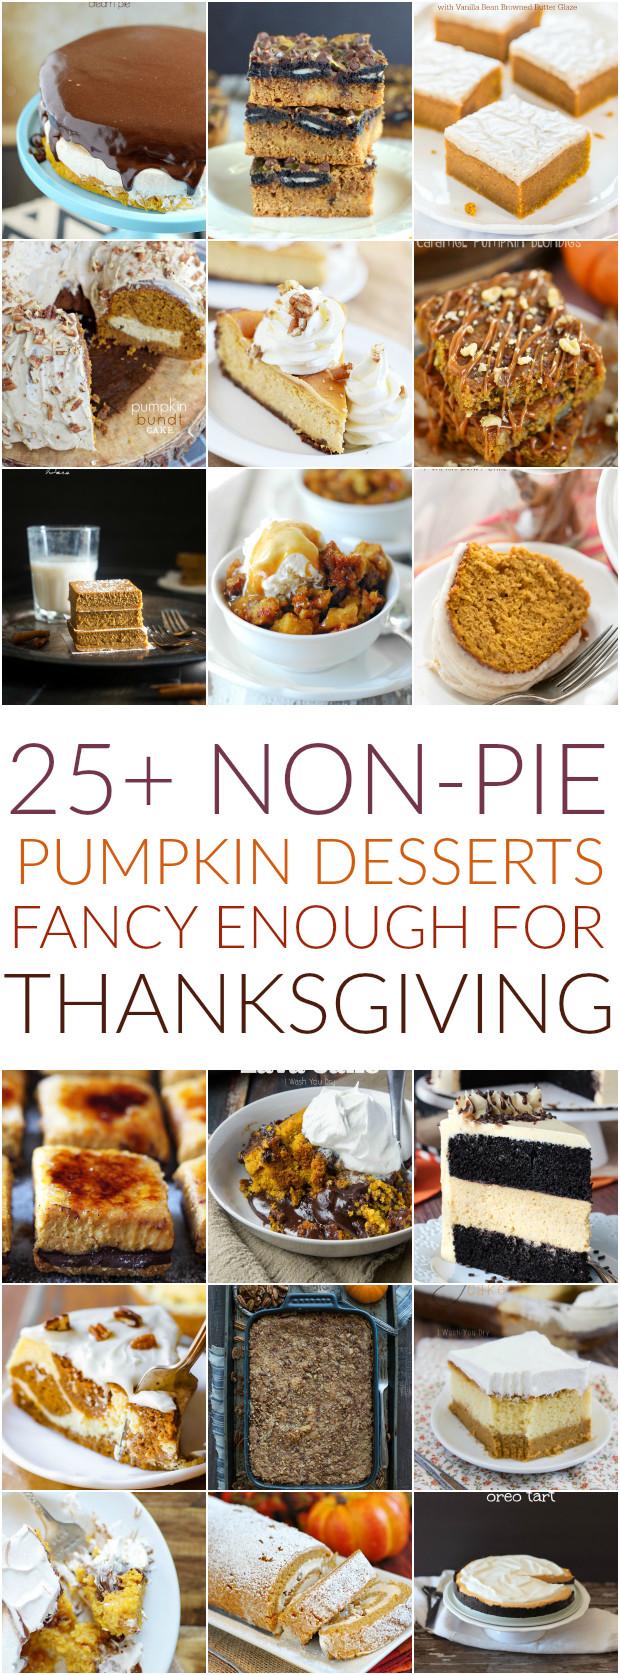 Fancy Thanksgiving Desserts  25 non pie Pumpkin Desserts Fancy Enough for